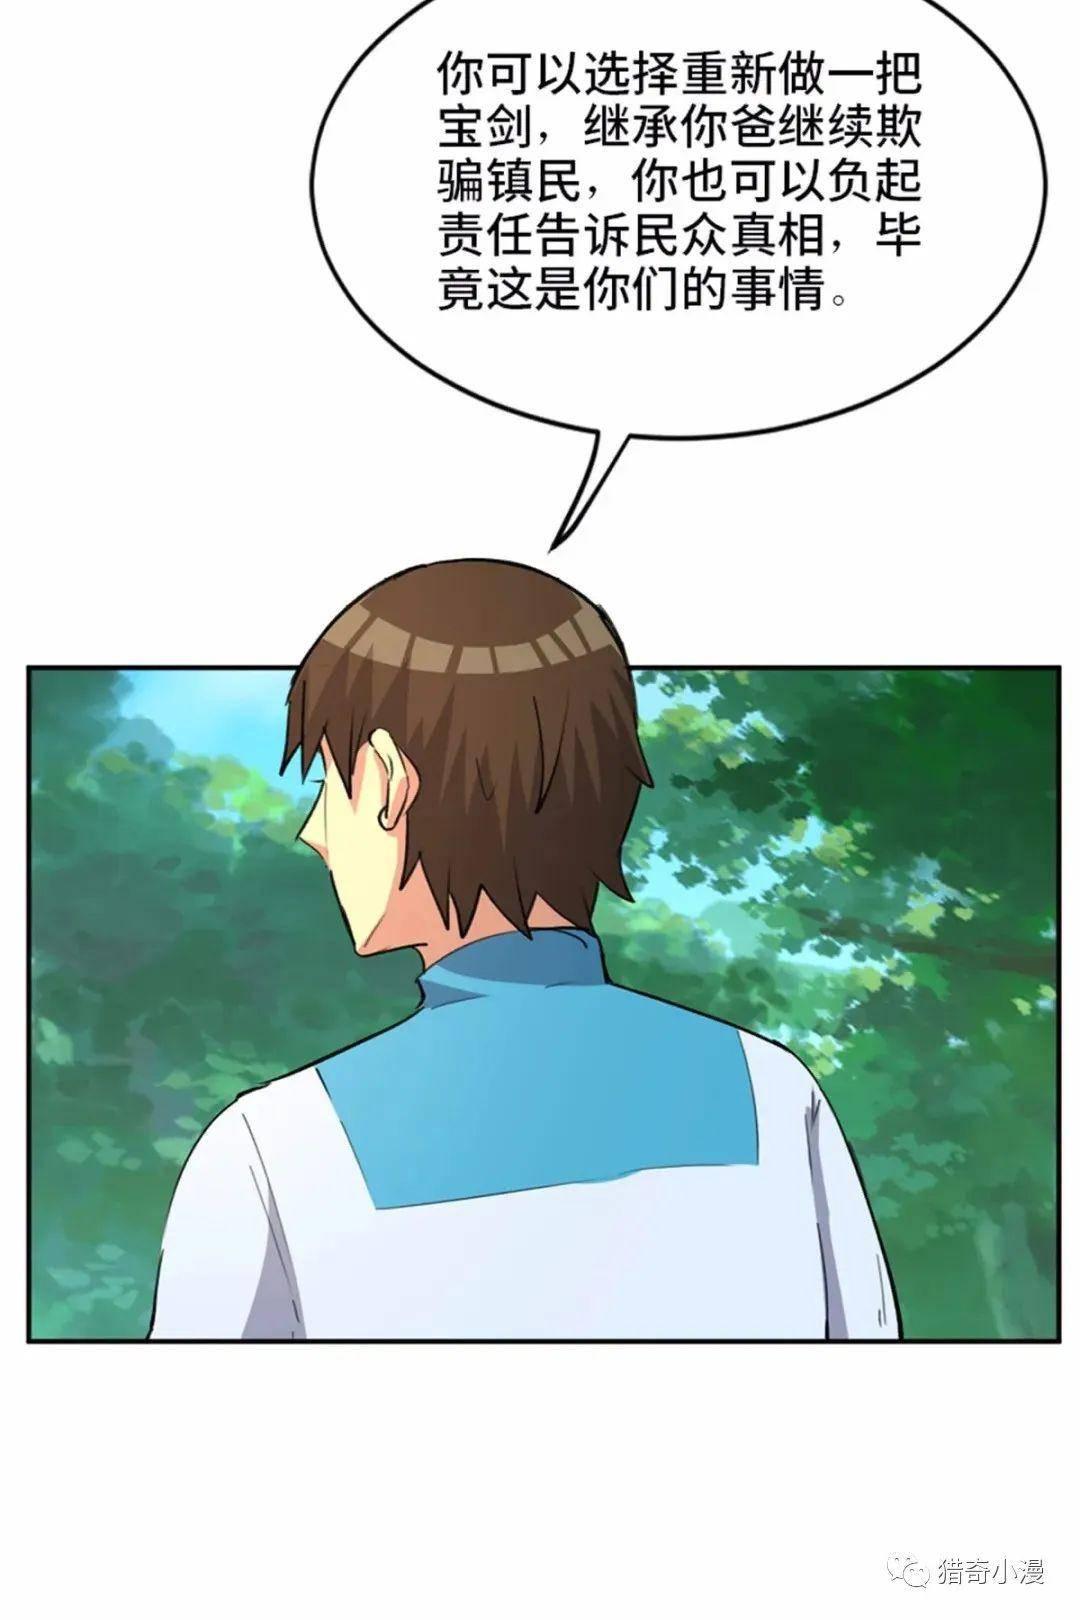 doctor异乡人李钟硕